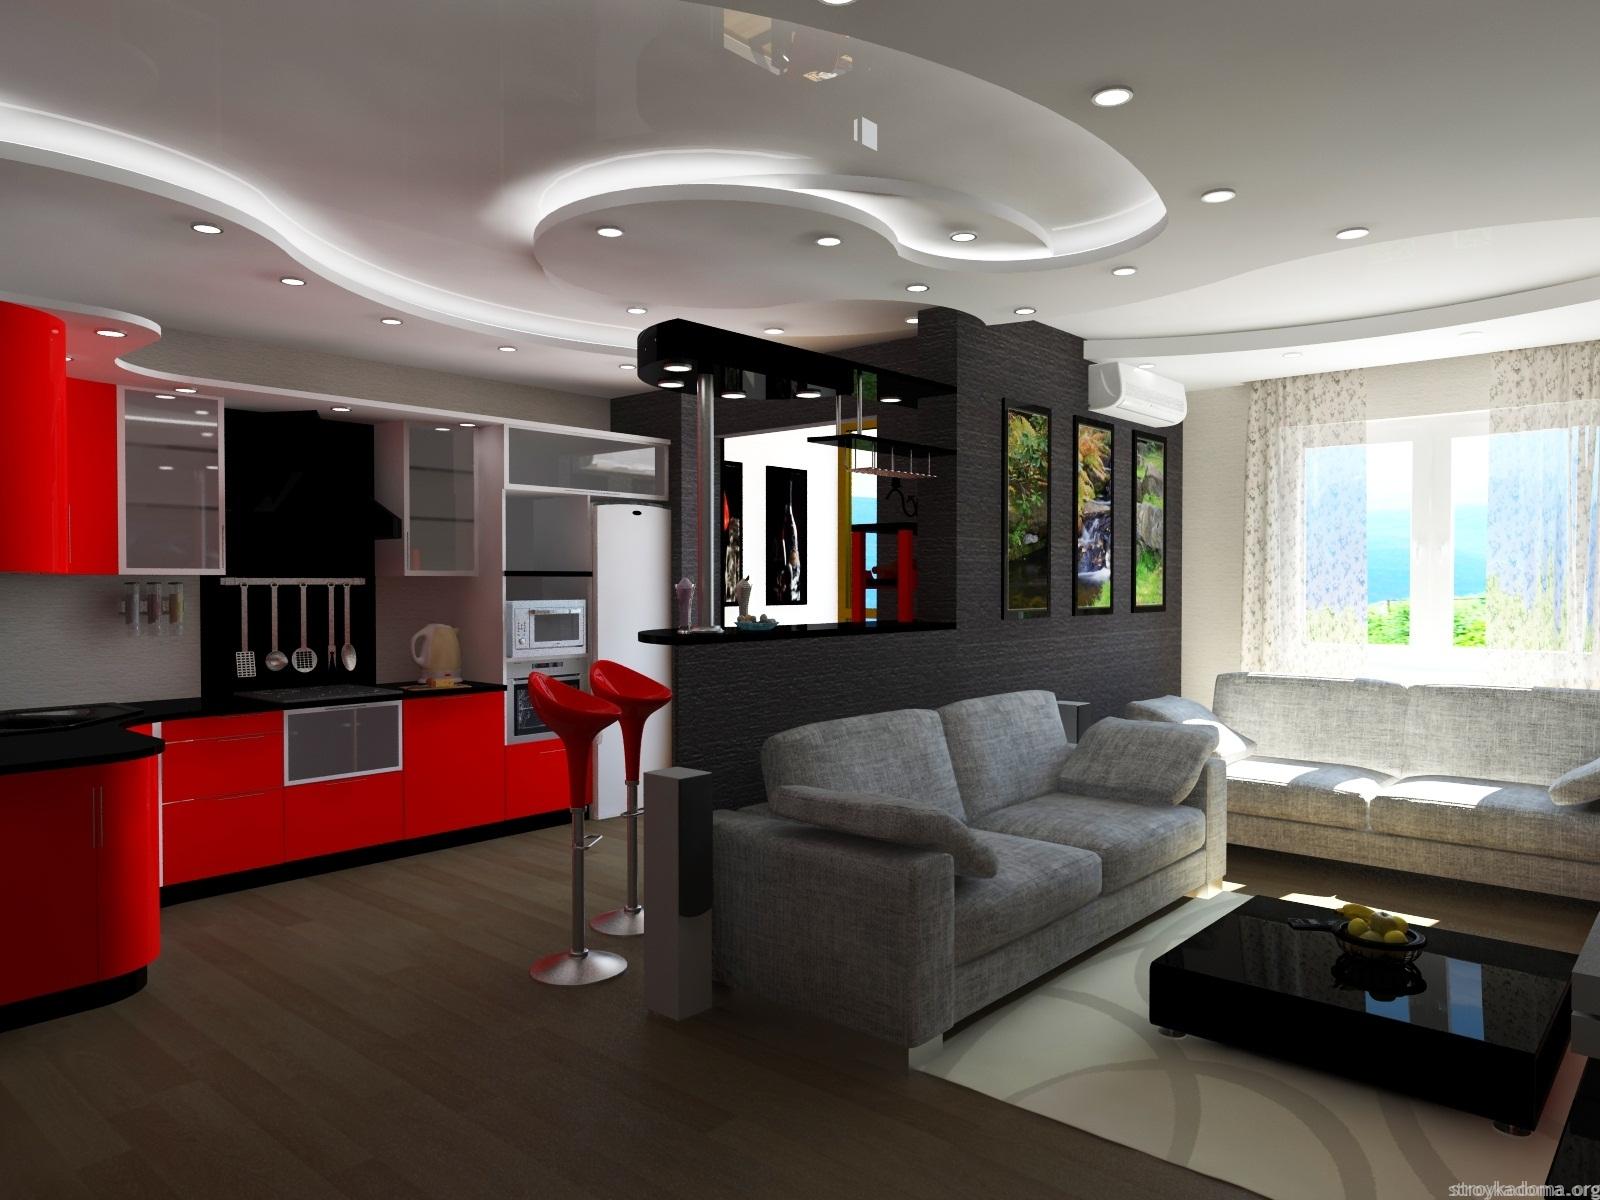 Кухня студия в квартире фото